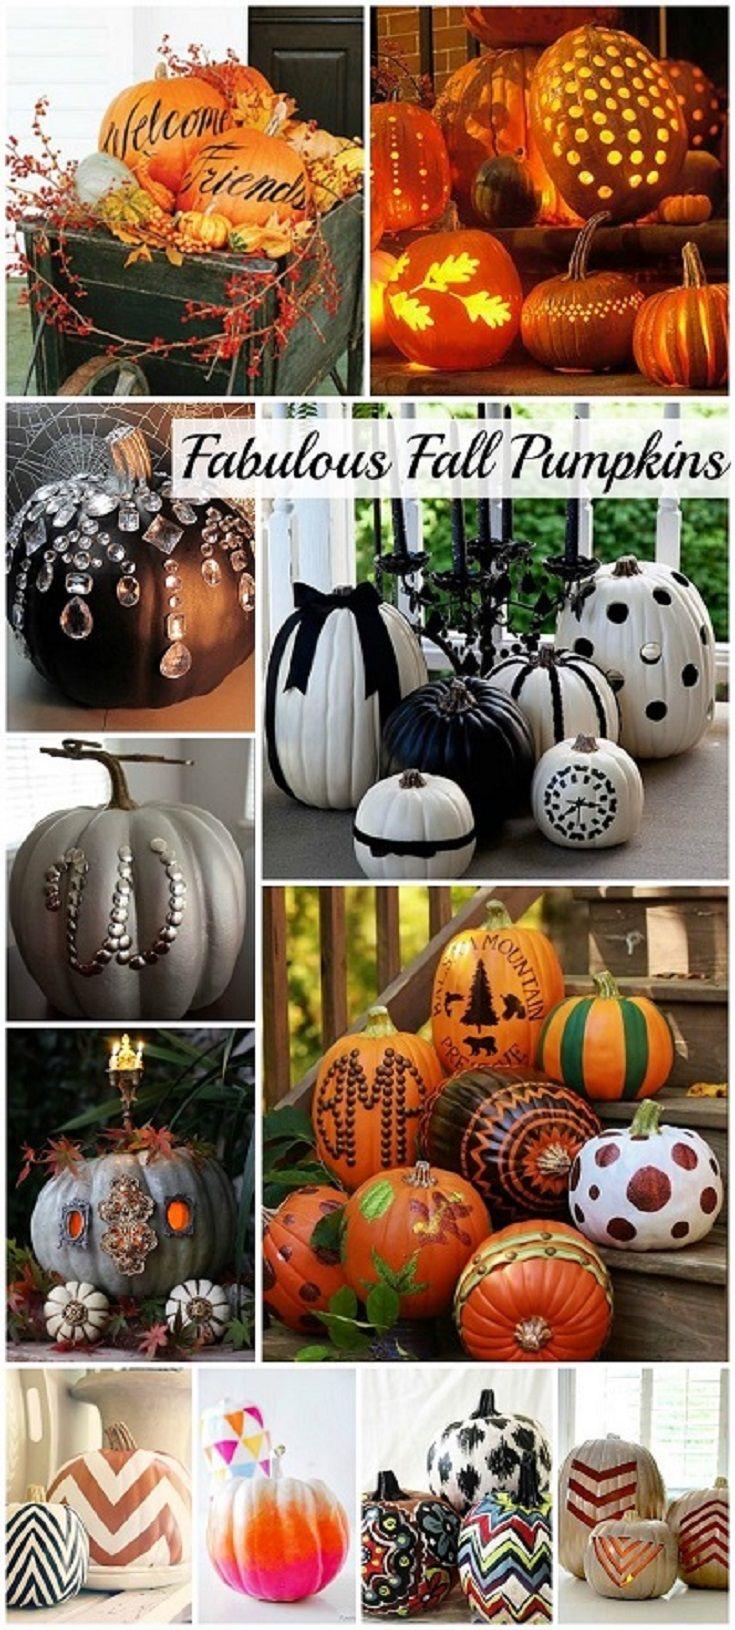 Fabulous Fall Pumpkin decorating ideas! #DIY #Fall @Christy Polek Polek Polek…